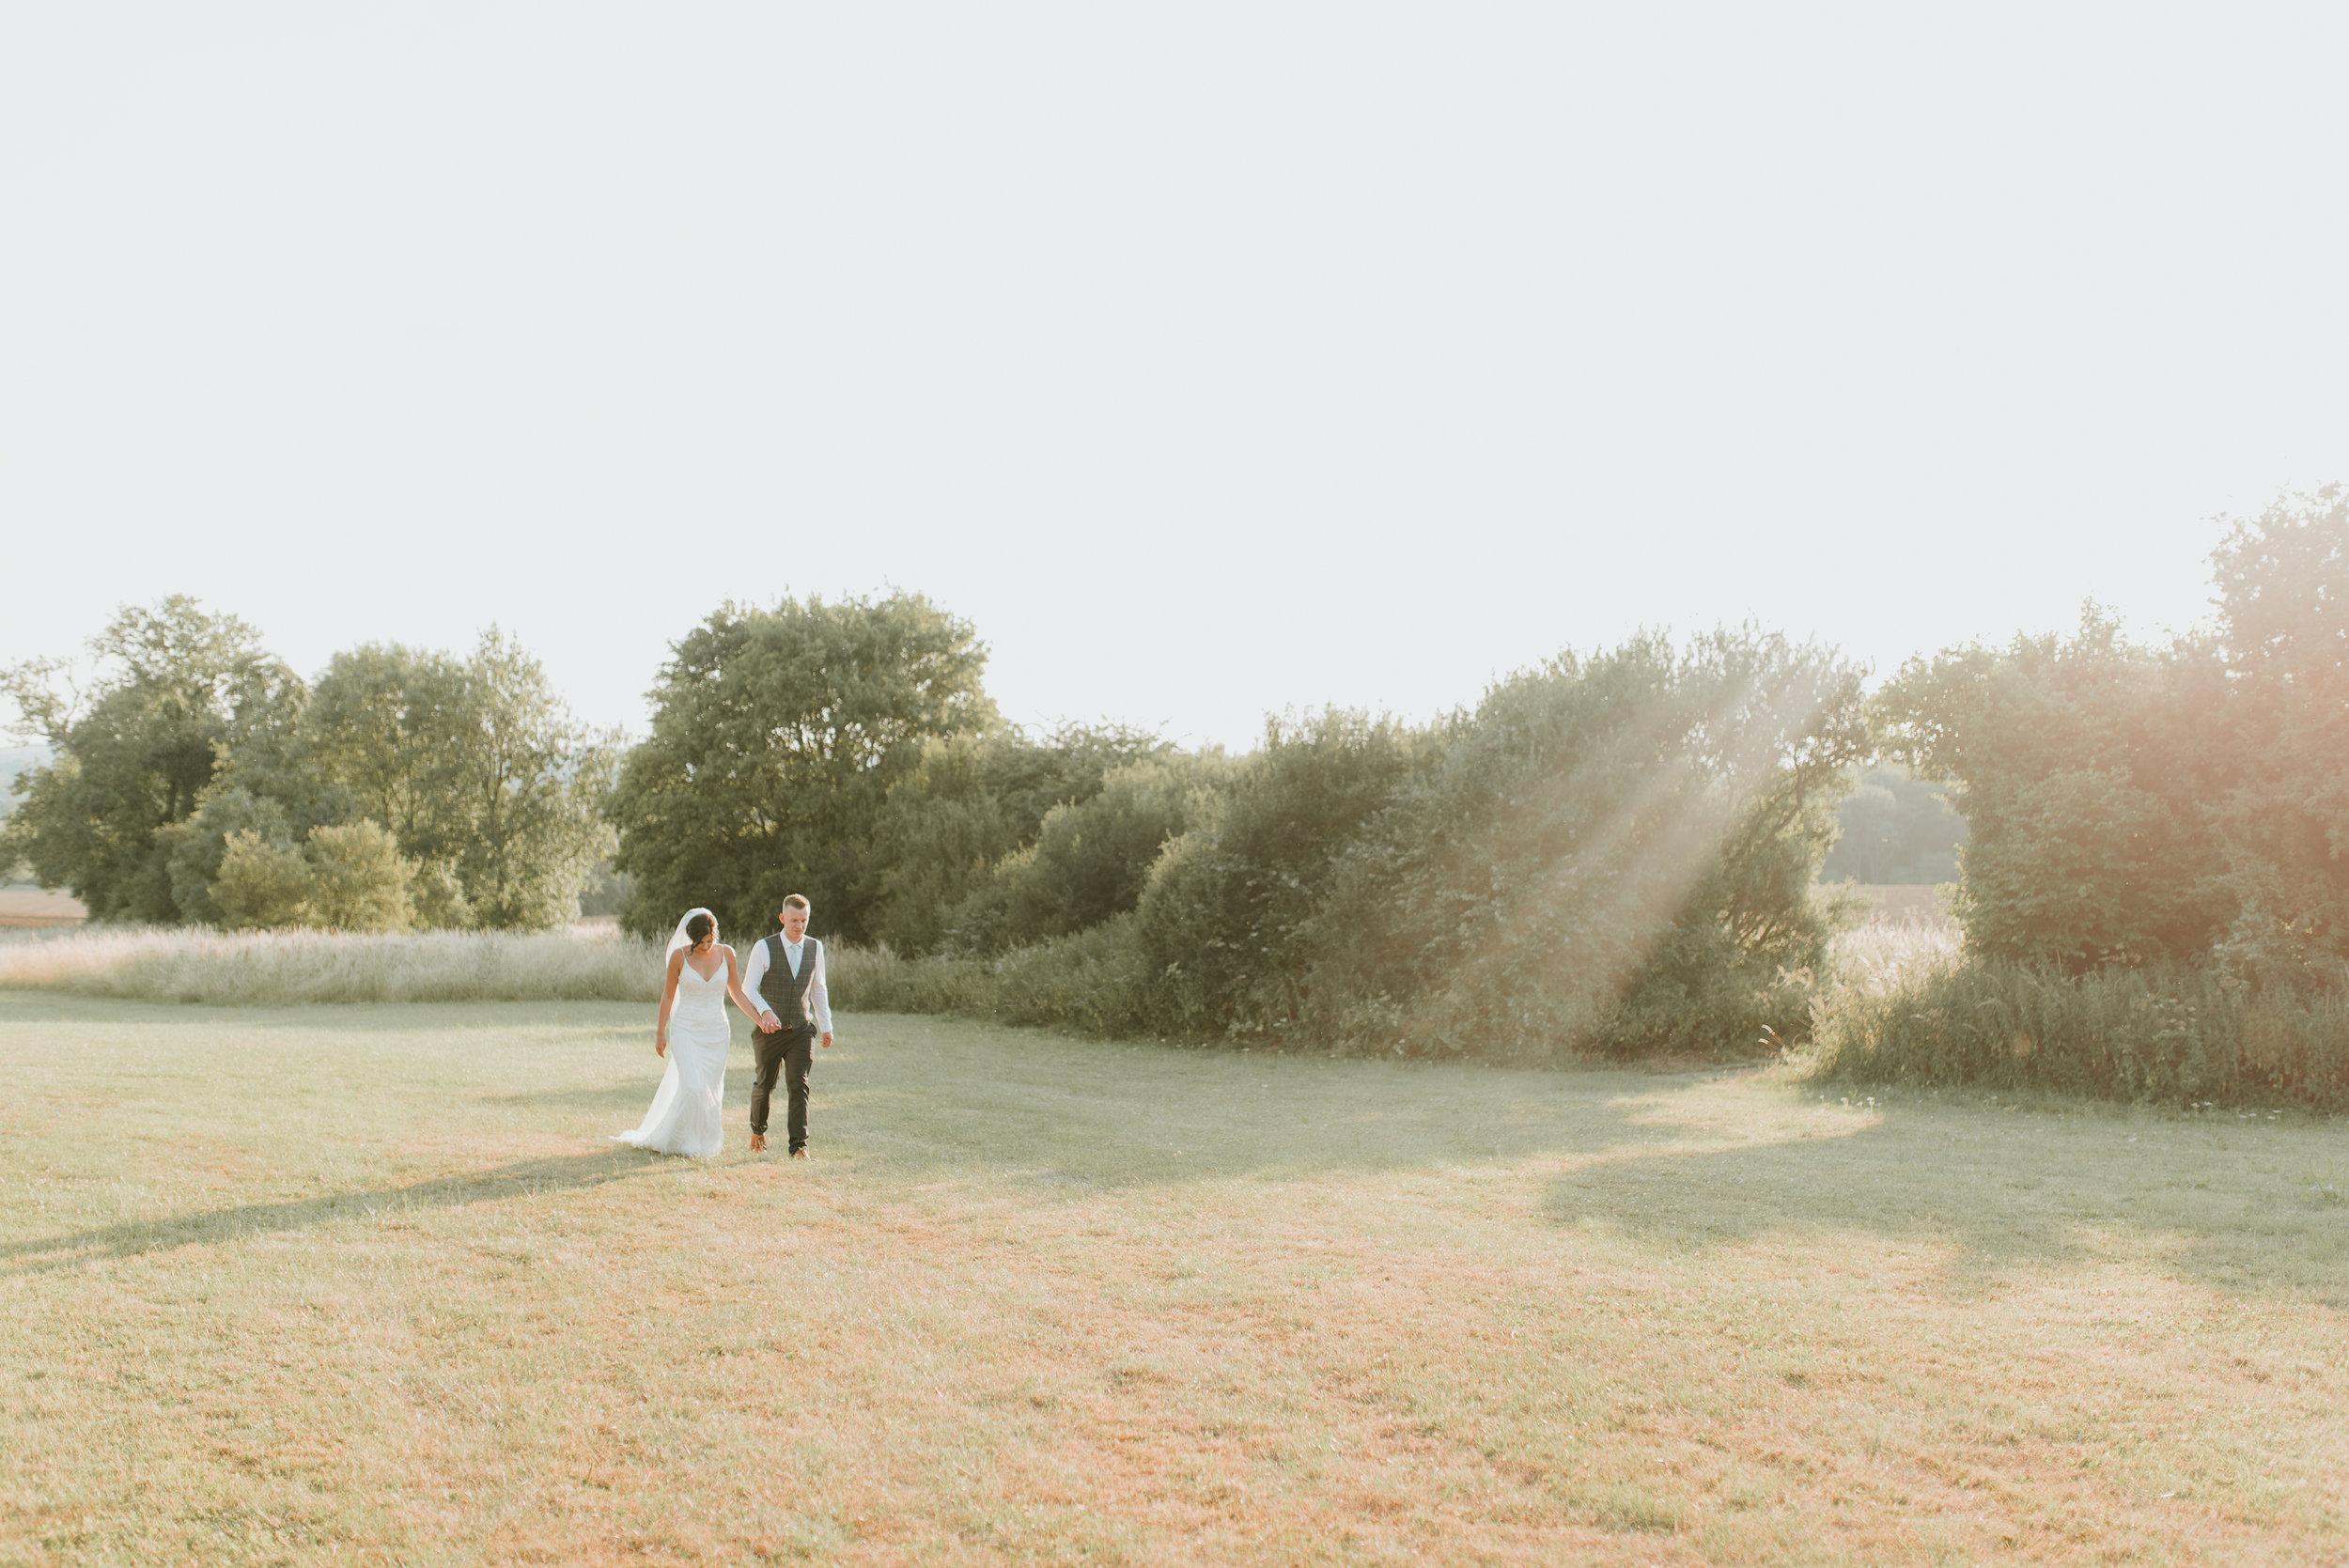 Oxfordshire-wedding-photographer-84.jpg